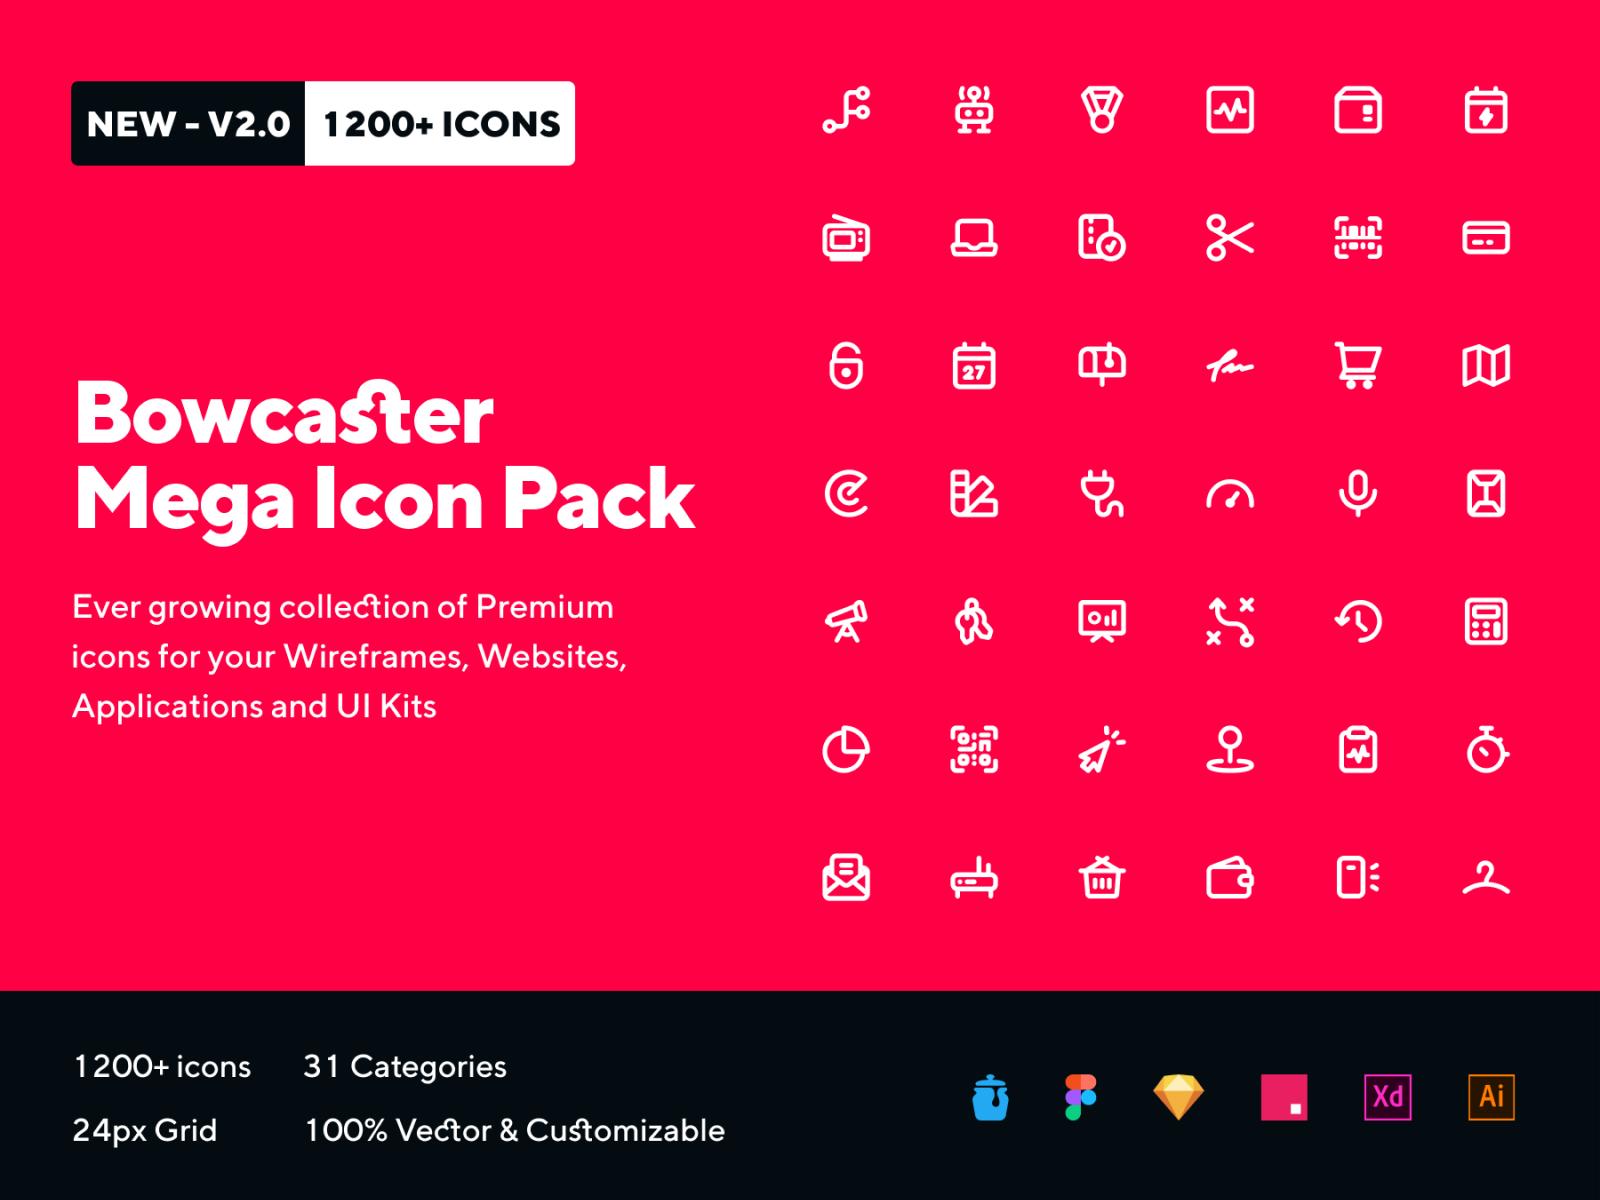 Bowcaster Mega Icon Pack Tarful